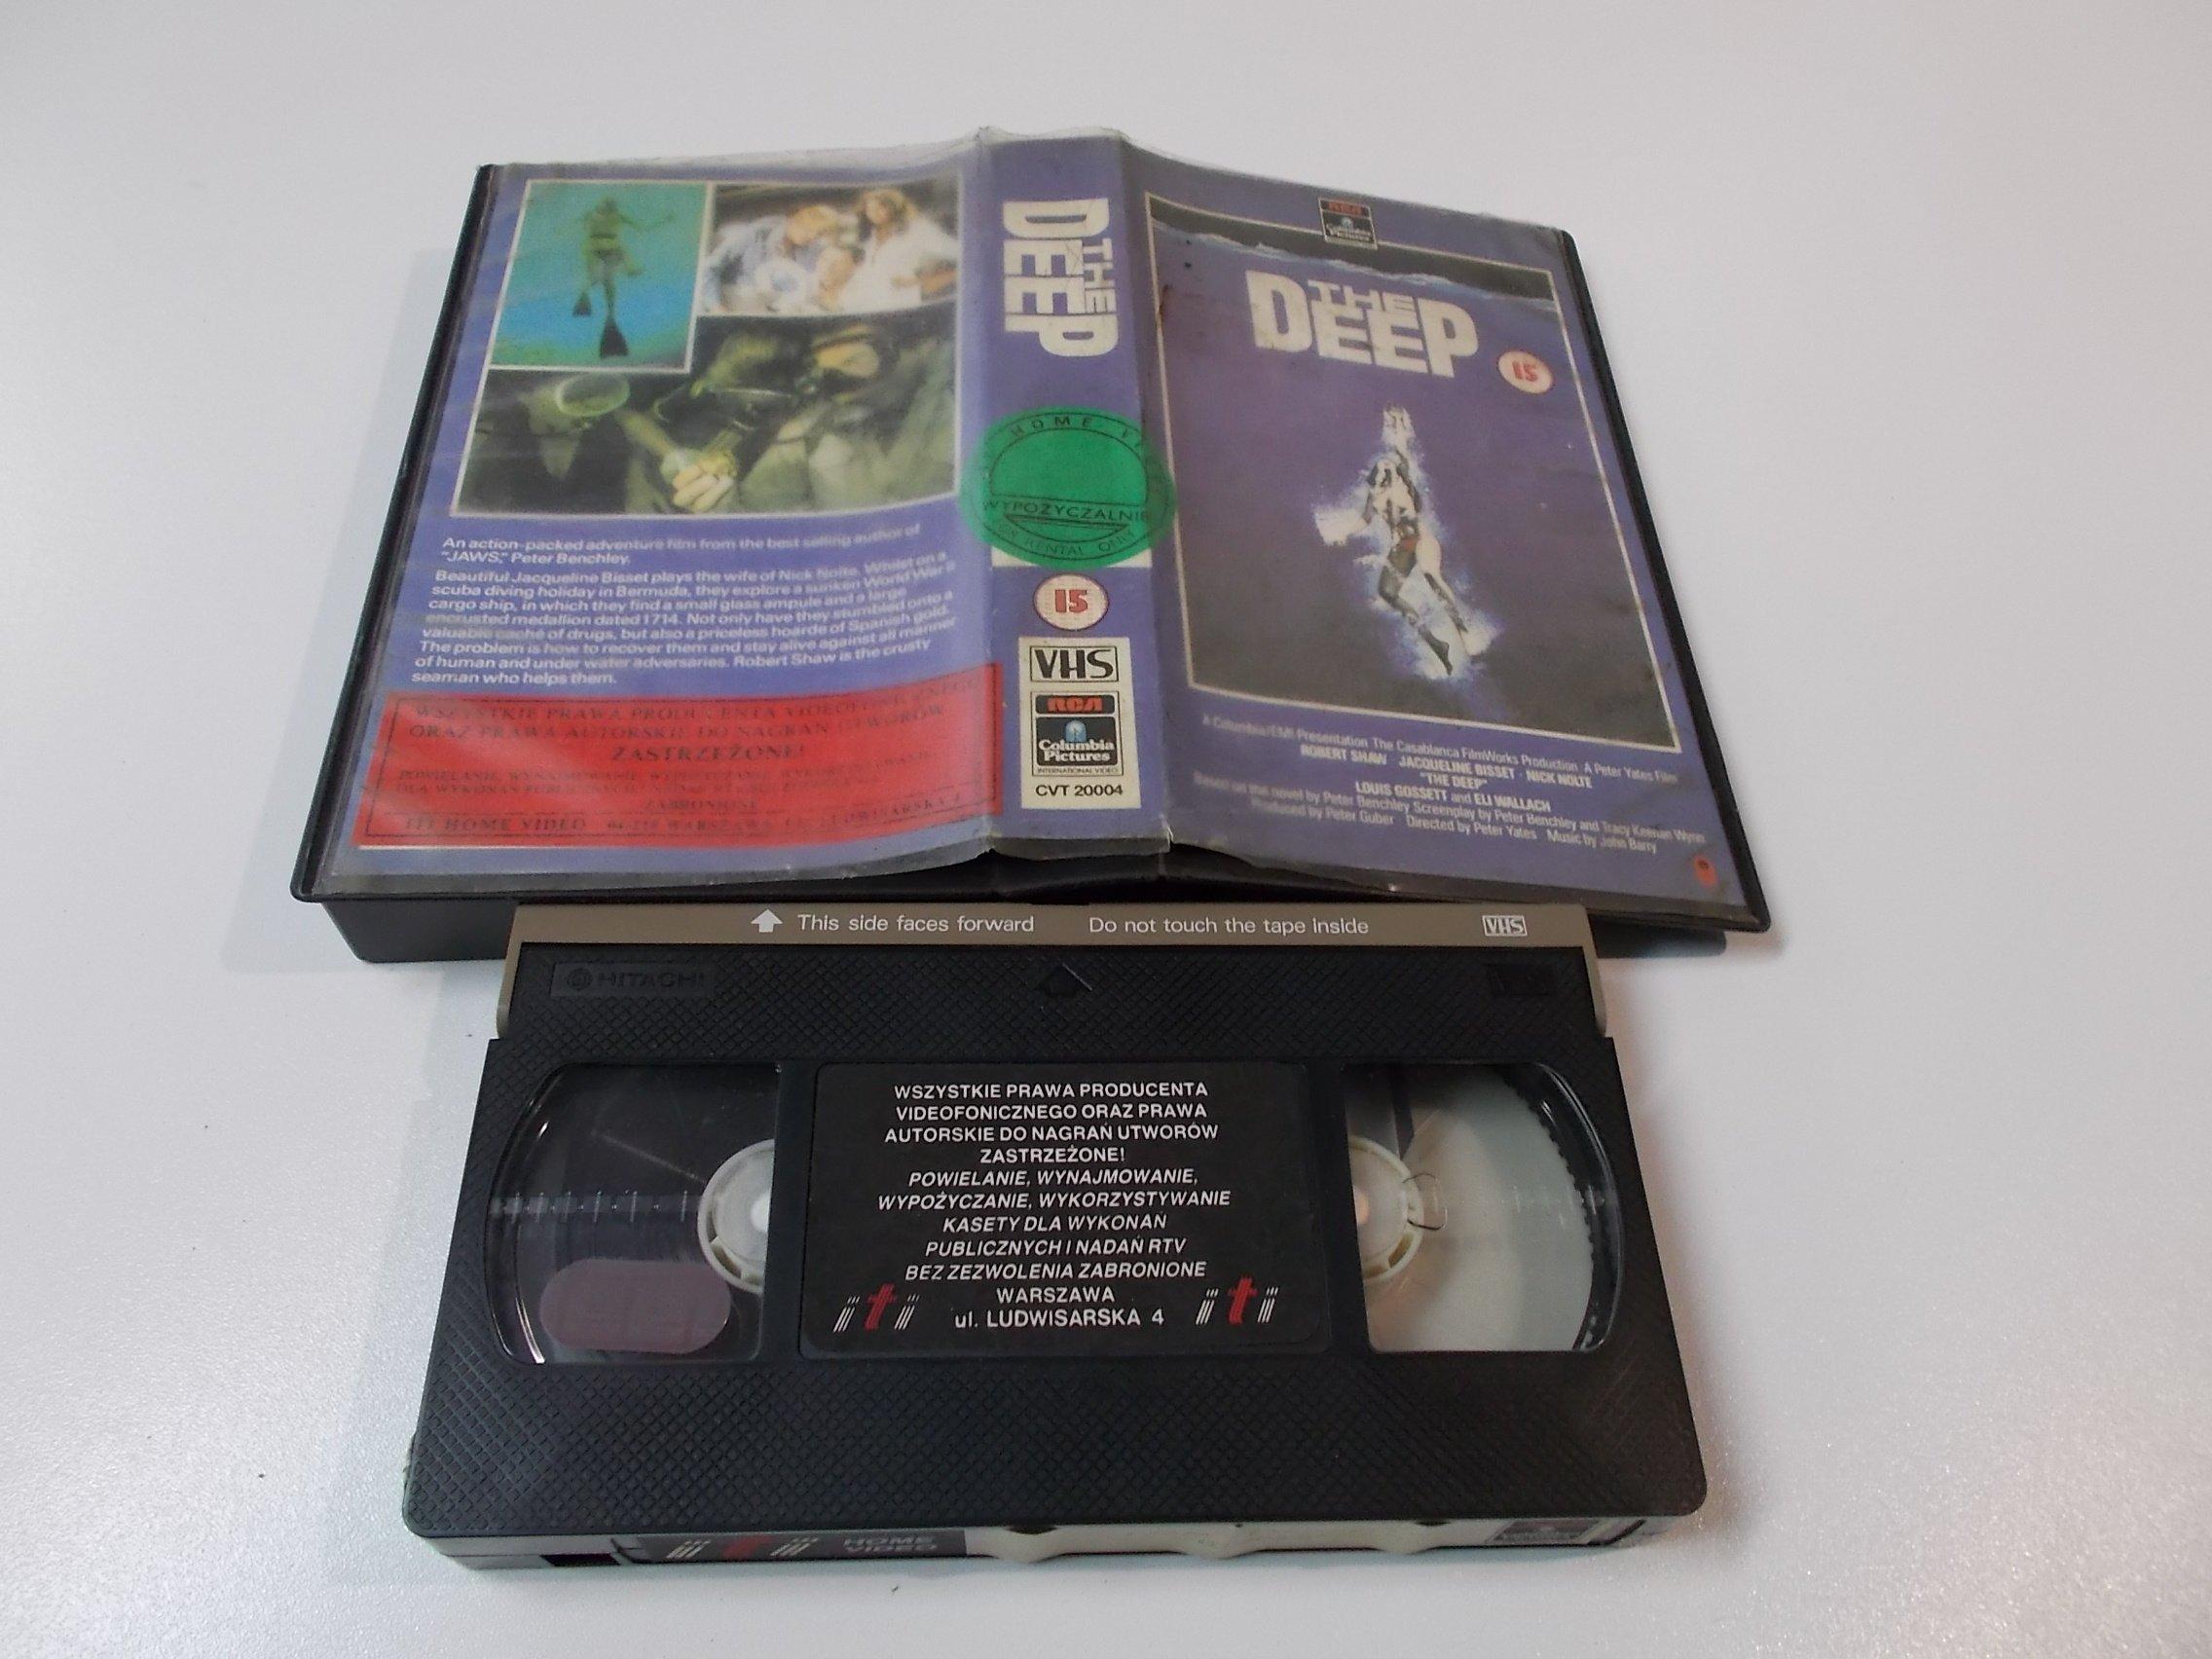 GŁĘBIA - Kaseta Video VHS - Opole 1529